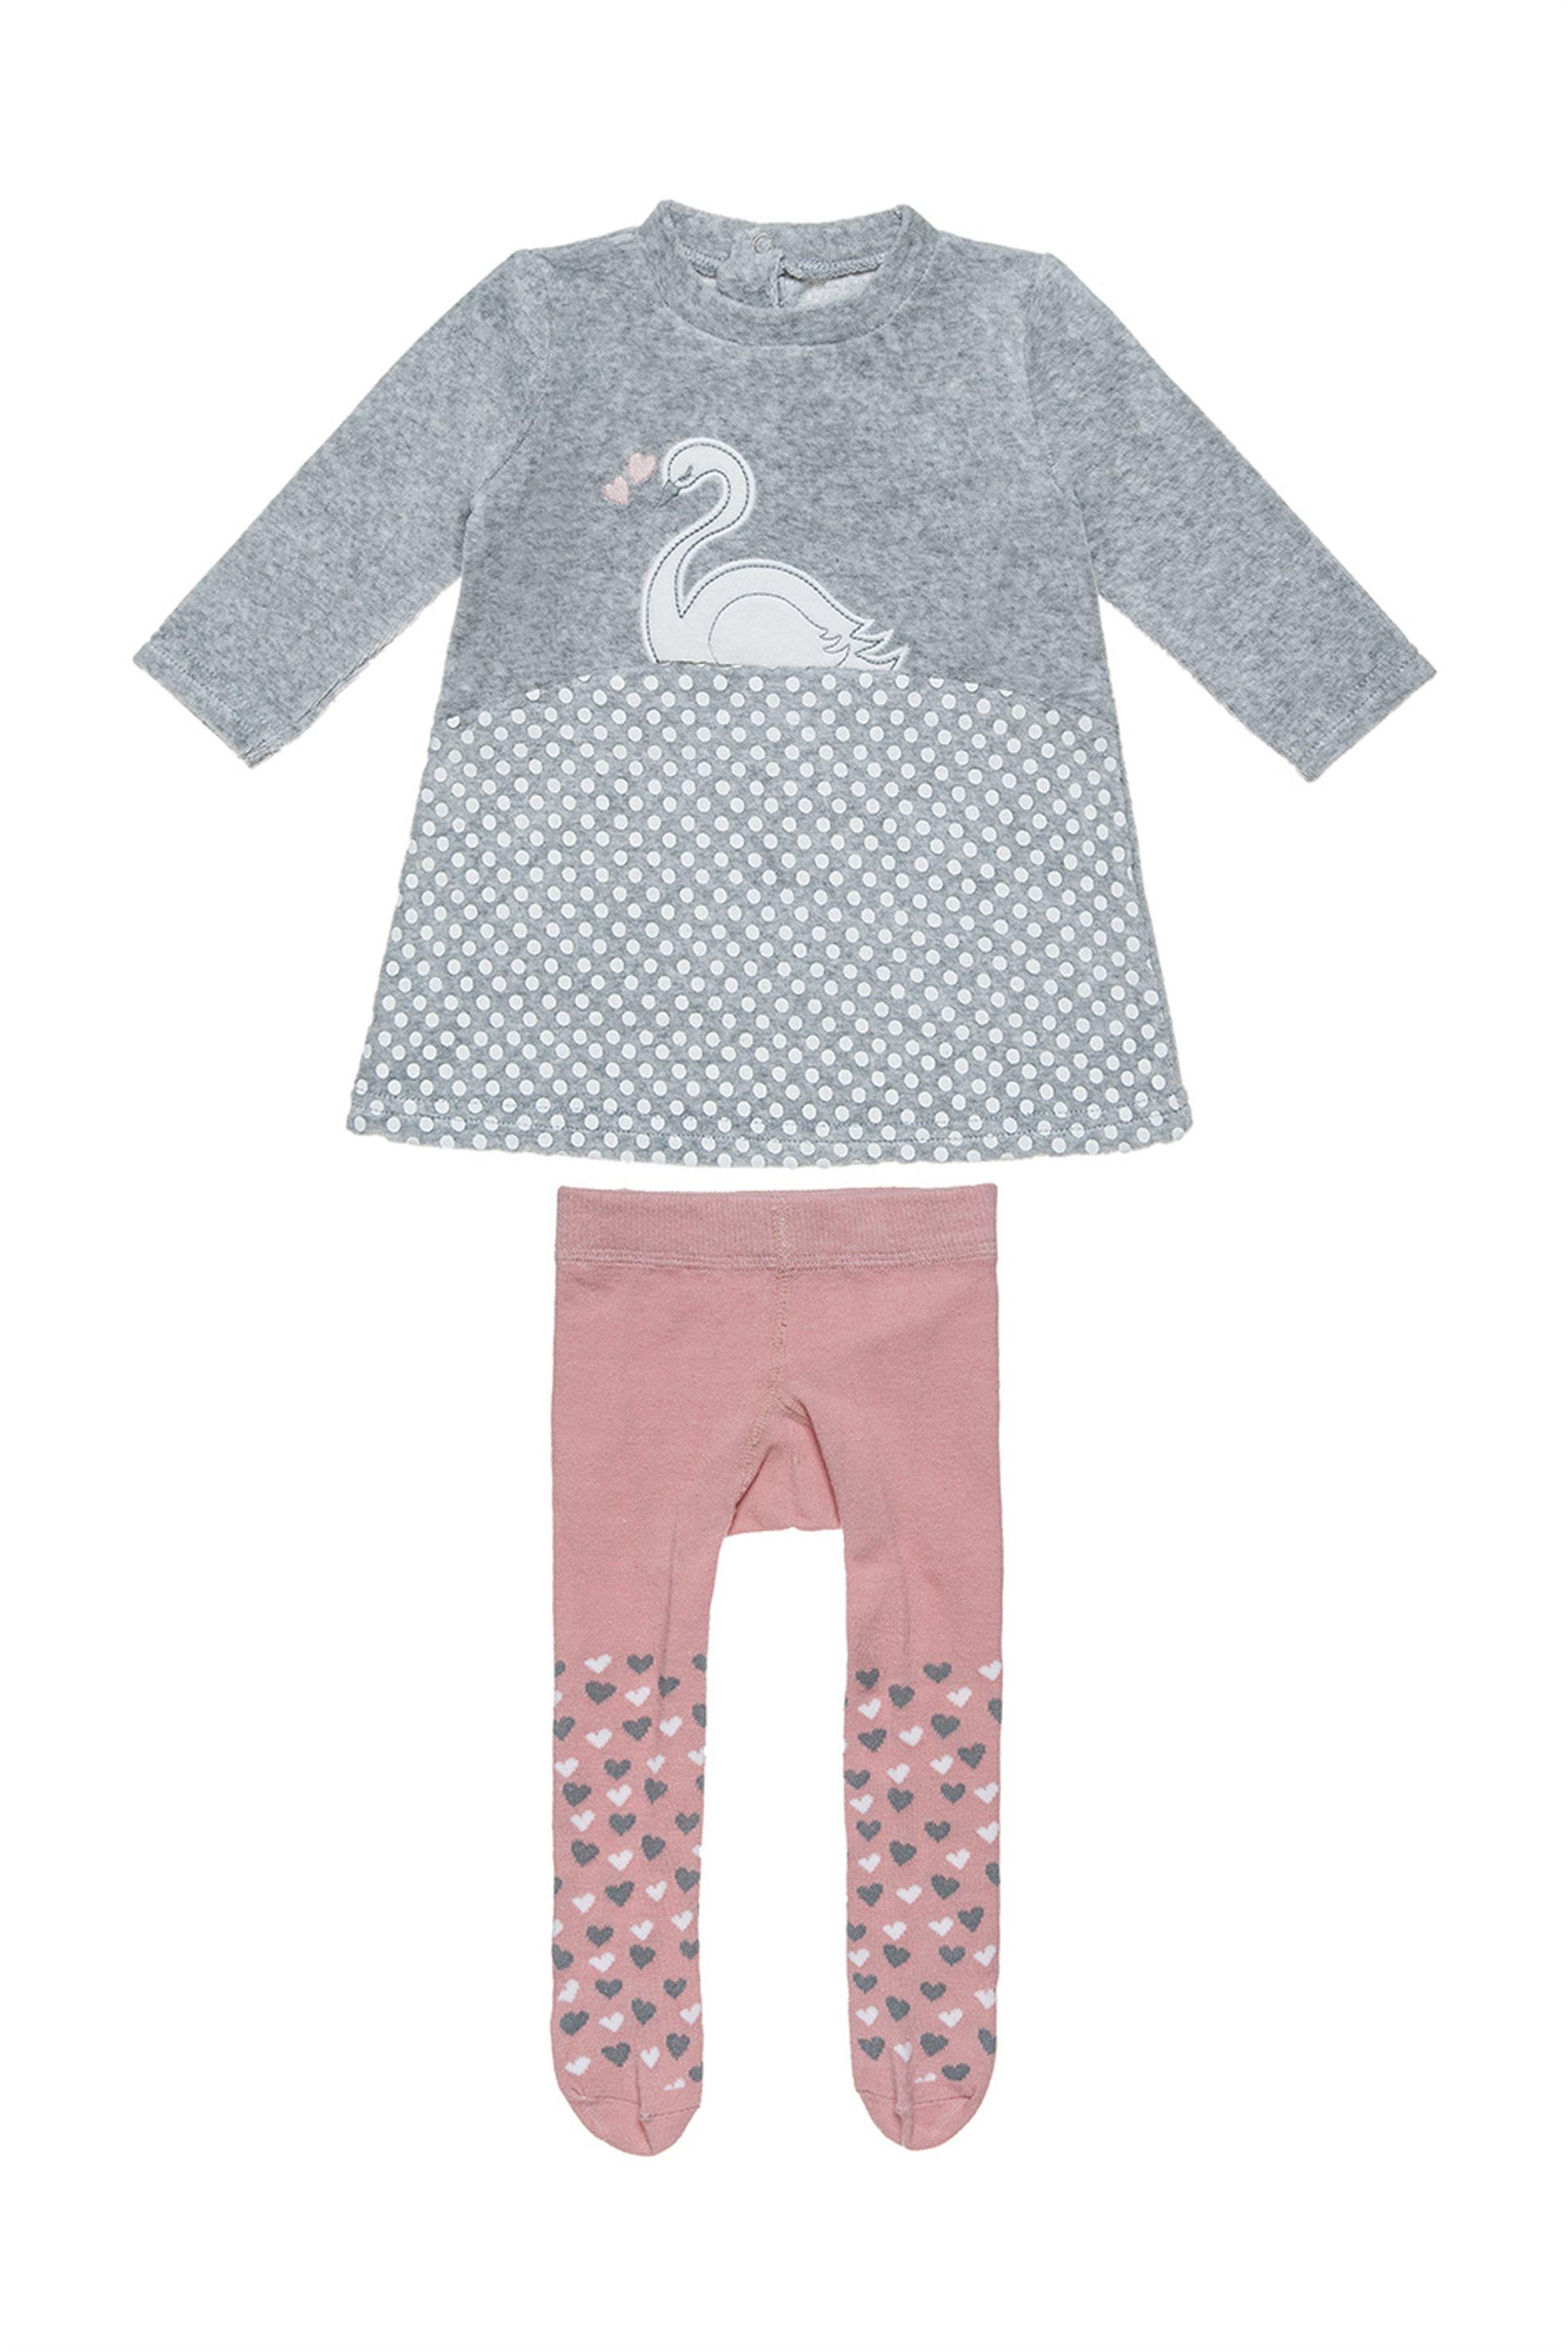 Alouette βρεφικό σετ φόρεμα βελούδινο με κυκνο καλσόν με print καρδιές - 0047062 παιδι   βρεφικα κοριτσι   0 3 ετων   ρούχα   σετ ρούχων   φορέματα   φούστες